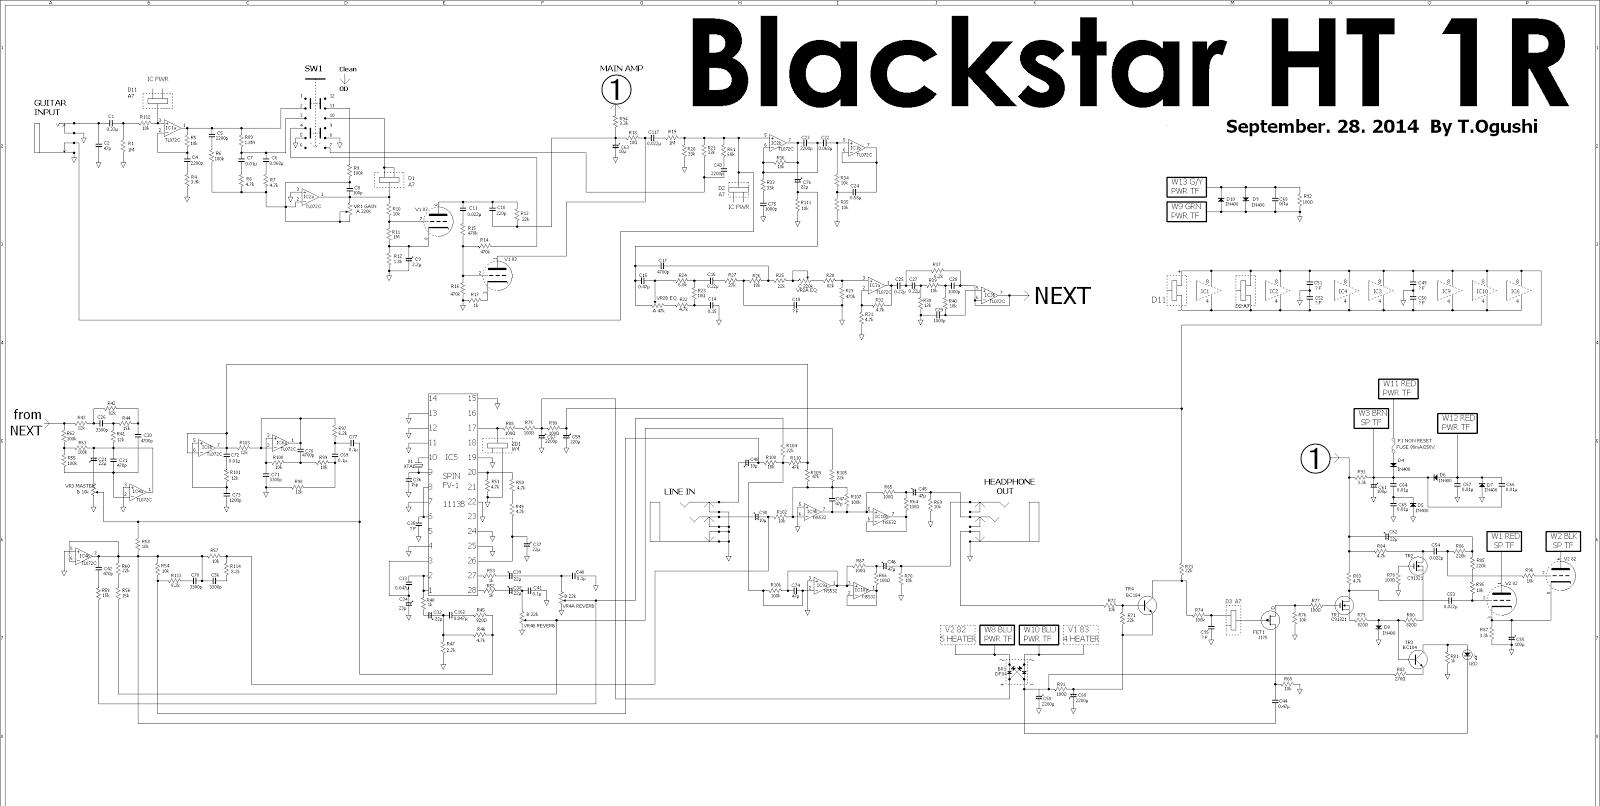 ht wiring diagram a96 btbw eastside it u2022 turbo 350 transmission rebuild diagram diagram h t [ 1600 x 806 Pixel ]